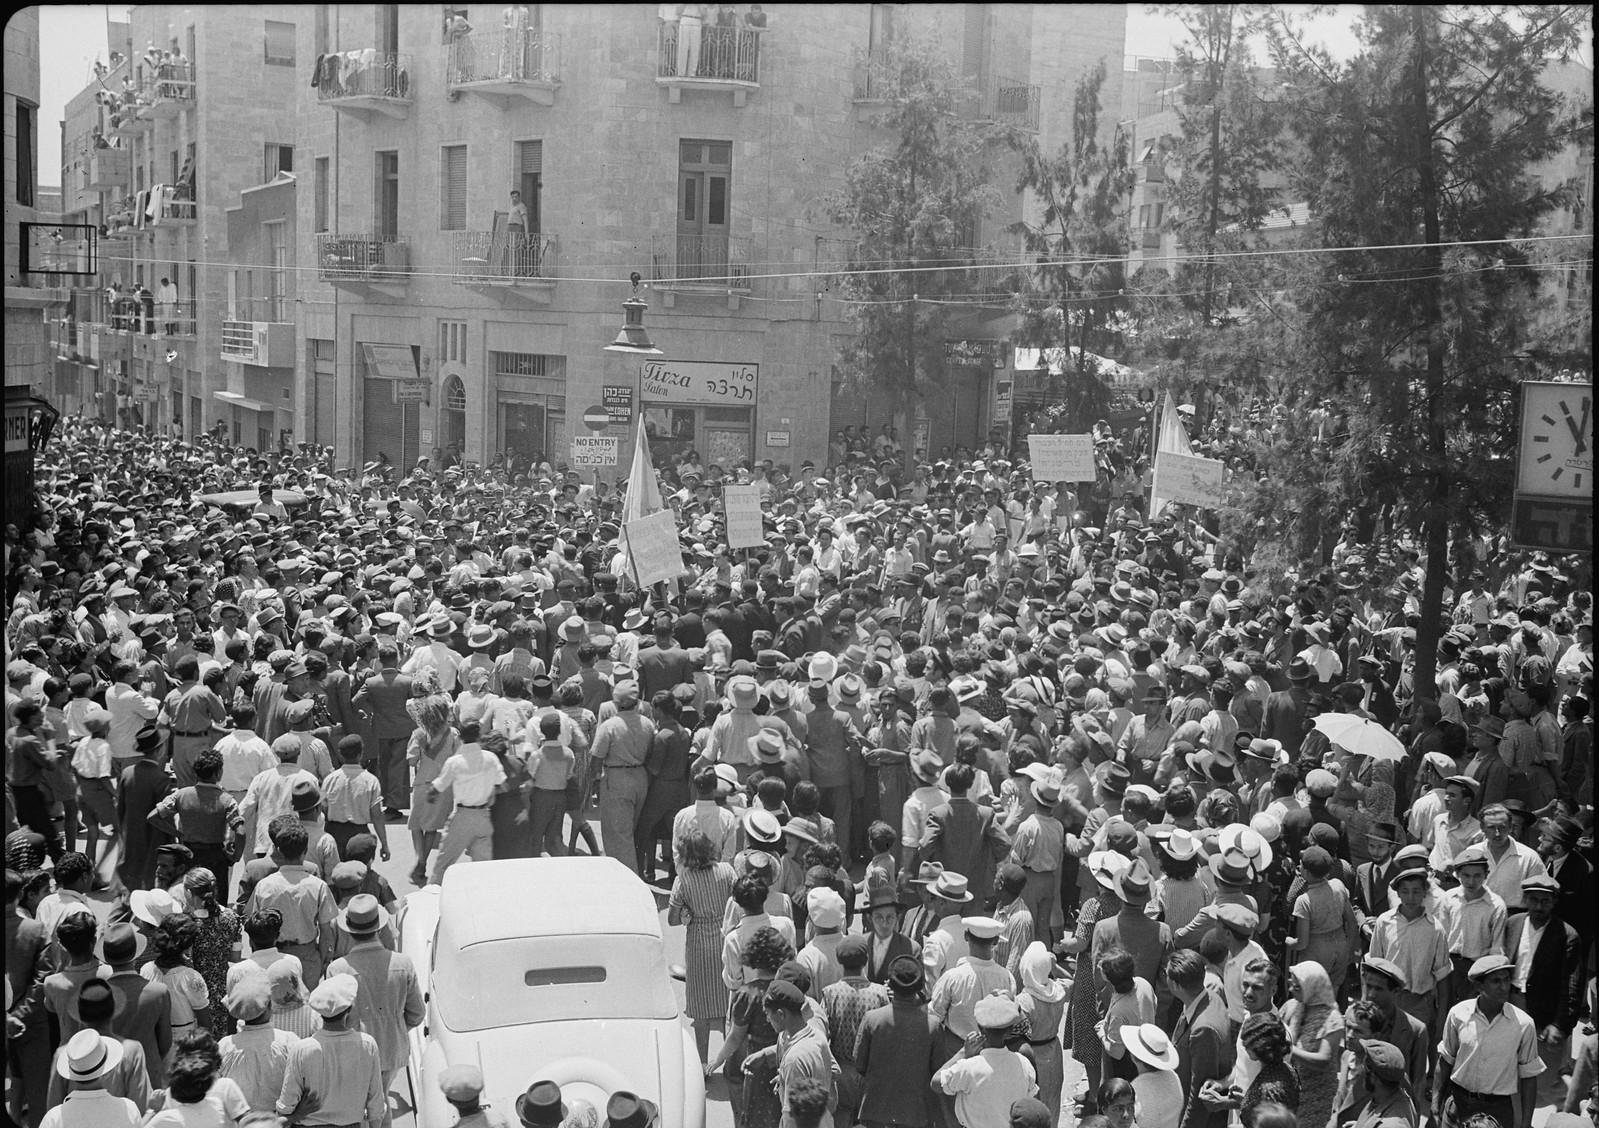 11. Митинг на углу улицы Кинг Джордж и дороги Агриппы